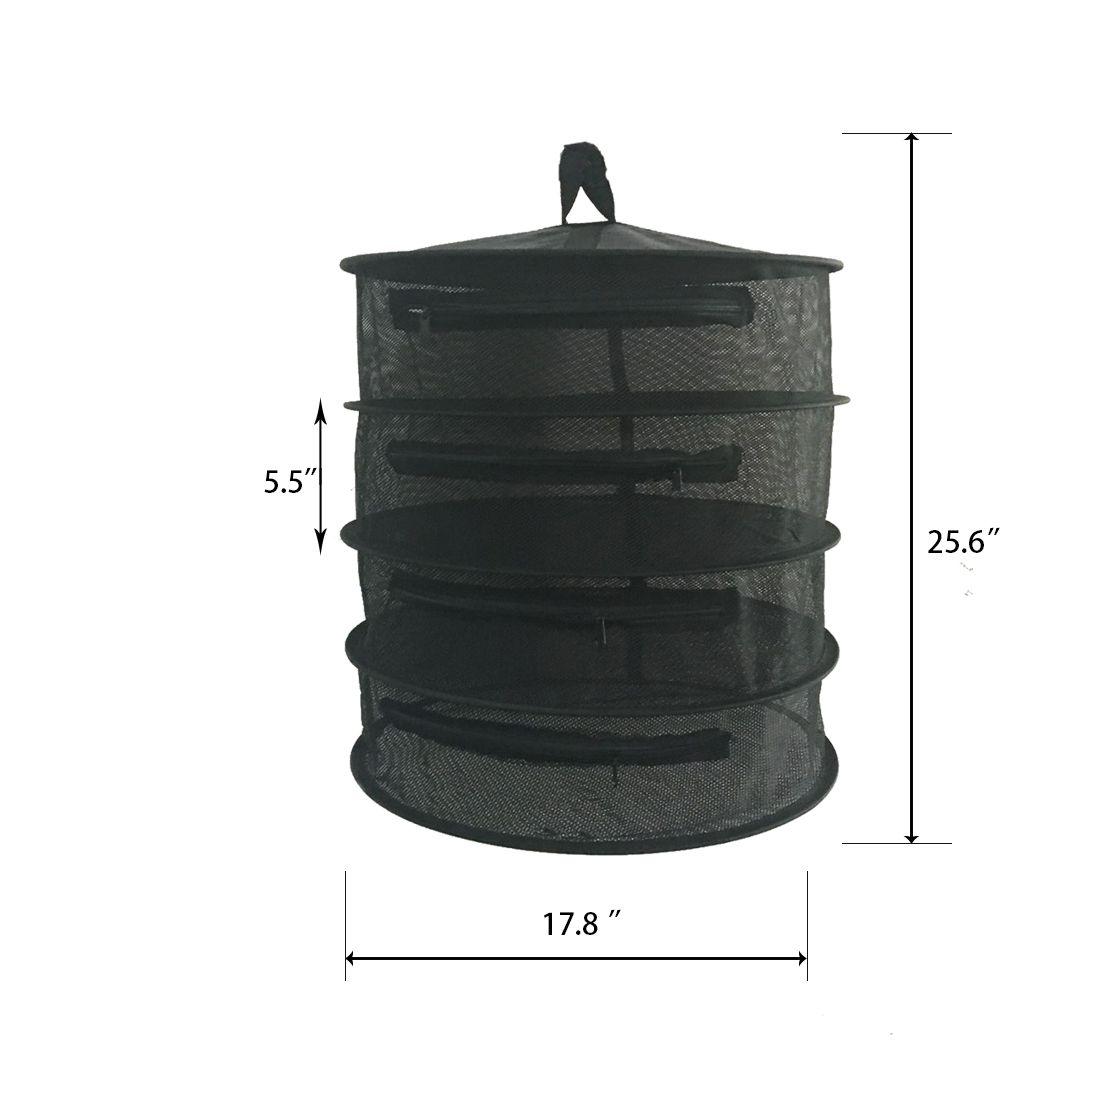 2019 178d X 256h Black 4 Tier Hanging Dry Rack Gorwtent Herb Bud